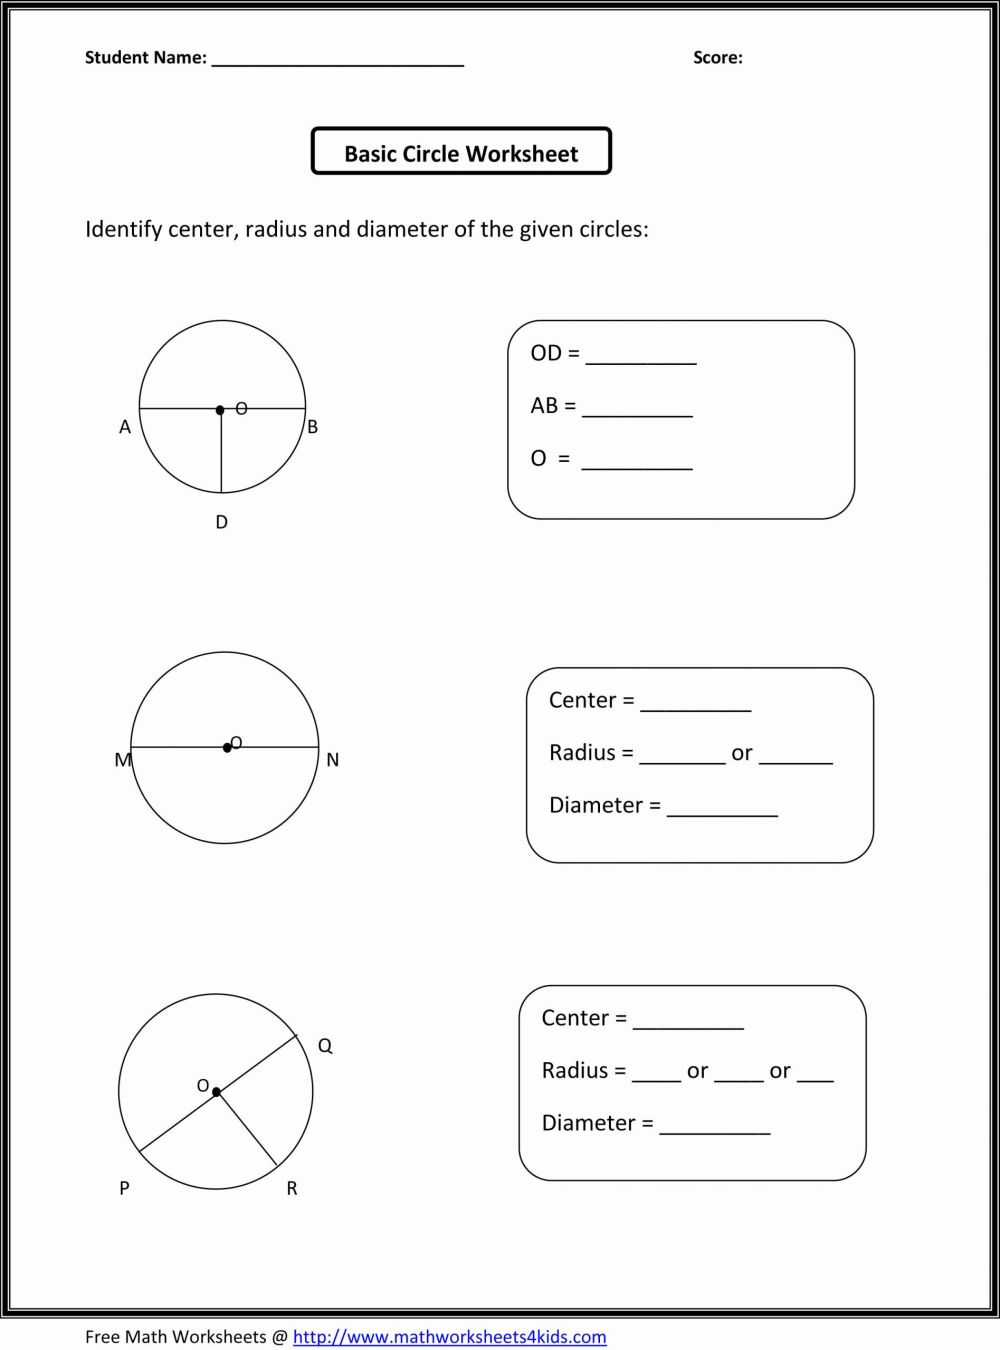 medium resolution of 4 Free Math Worksheets Third Grade 3 Measurement Metric Units Capacity L Ml  - apocalomegaproductions.com